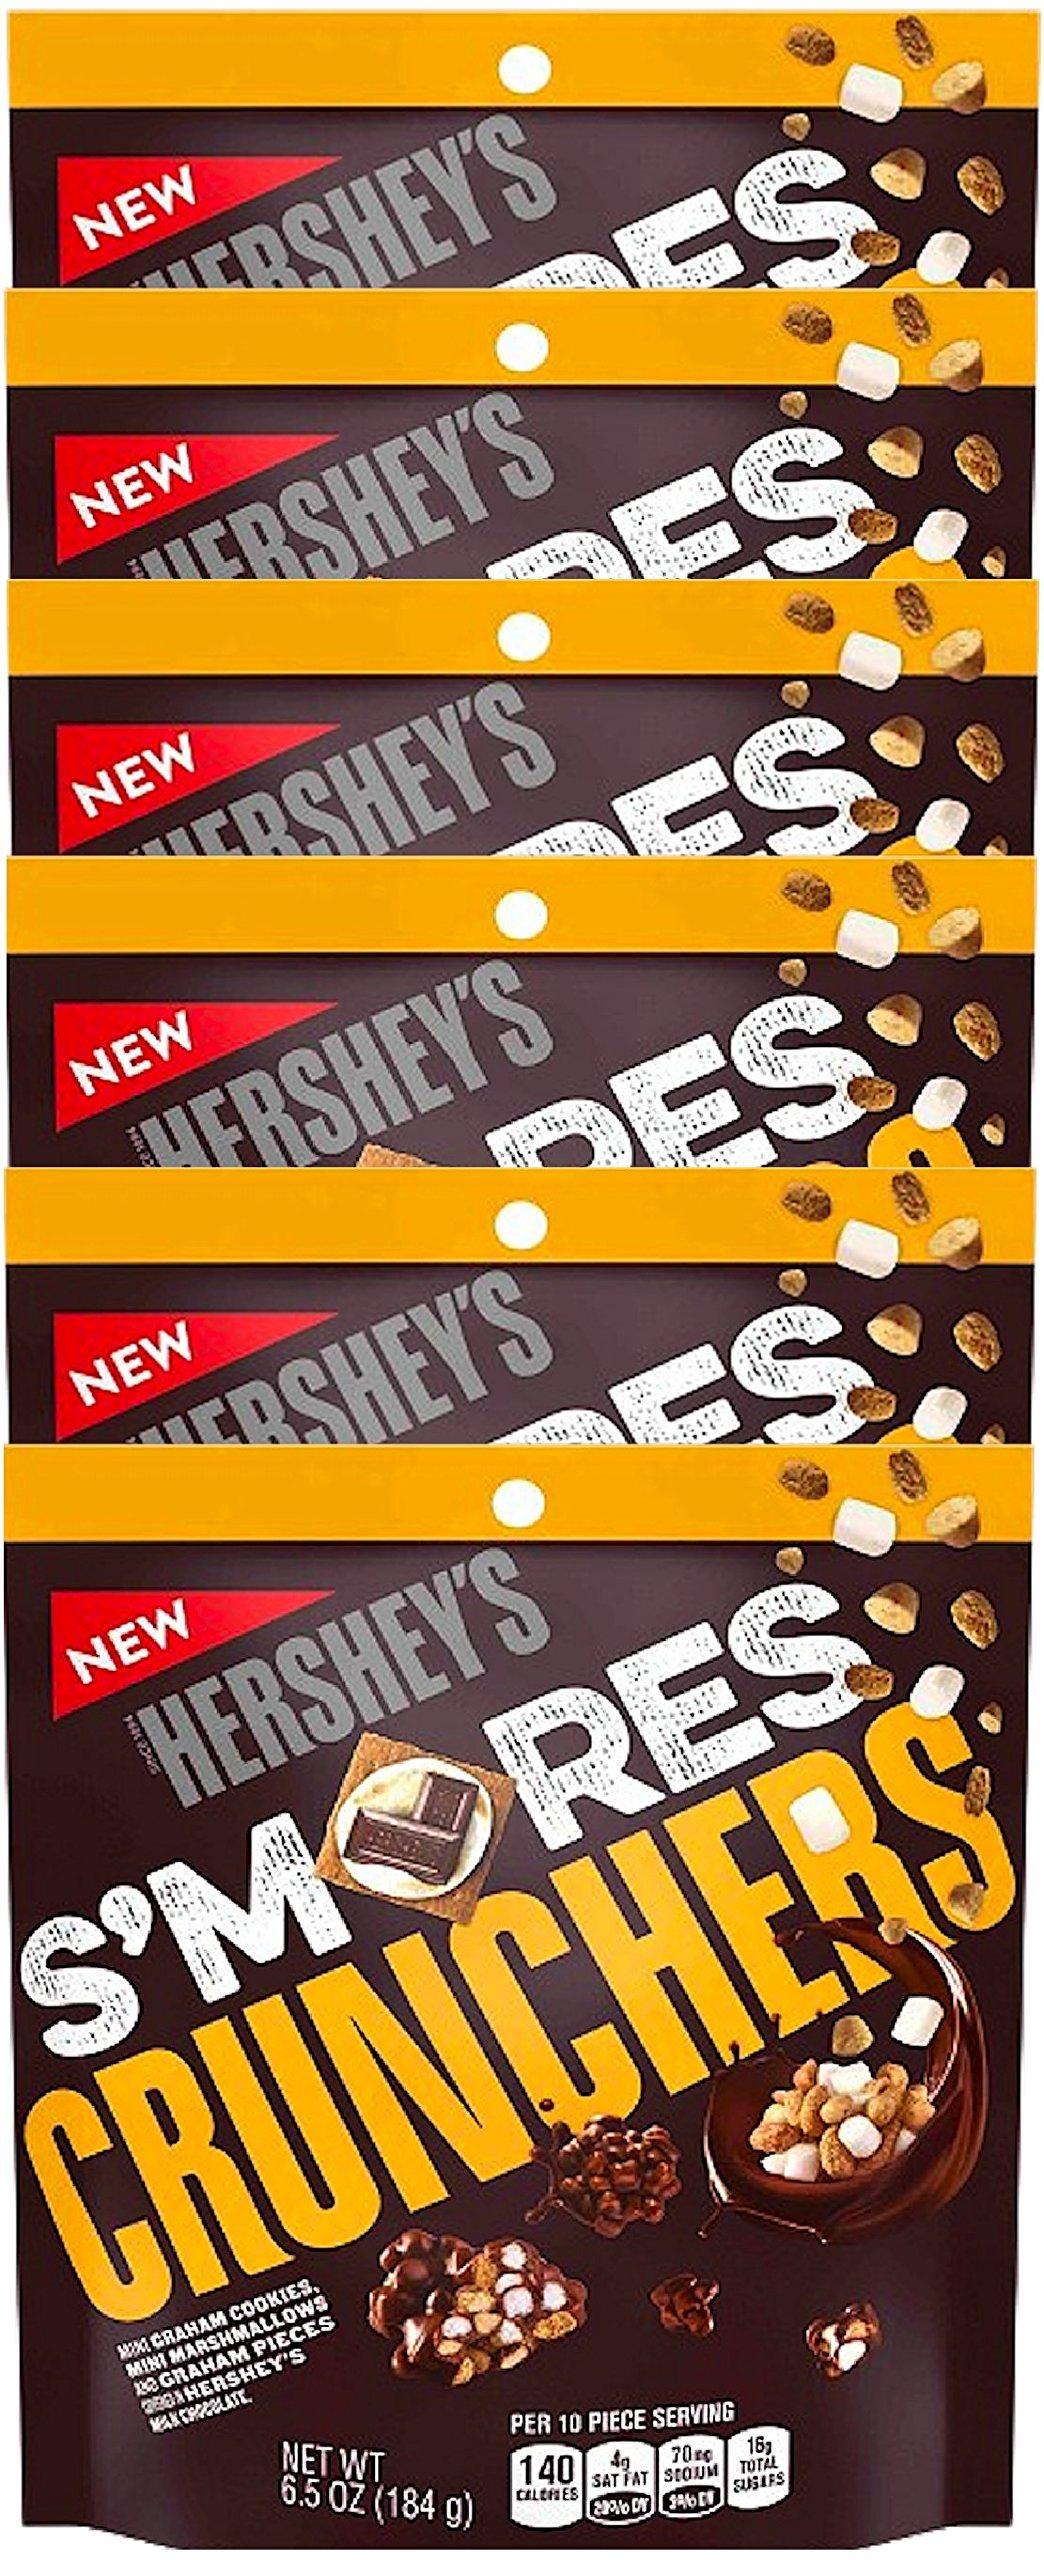 NEW Hershey's S'mores Crunchers Mini Graham Cookies Mini Marshmallows Covered In Hershey's Chocolate Heaven- 6.5oz (6)